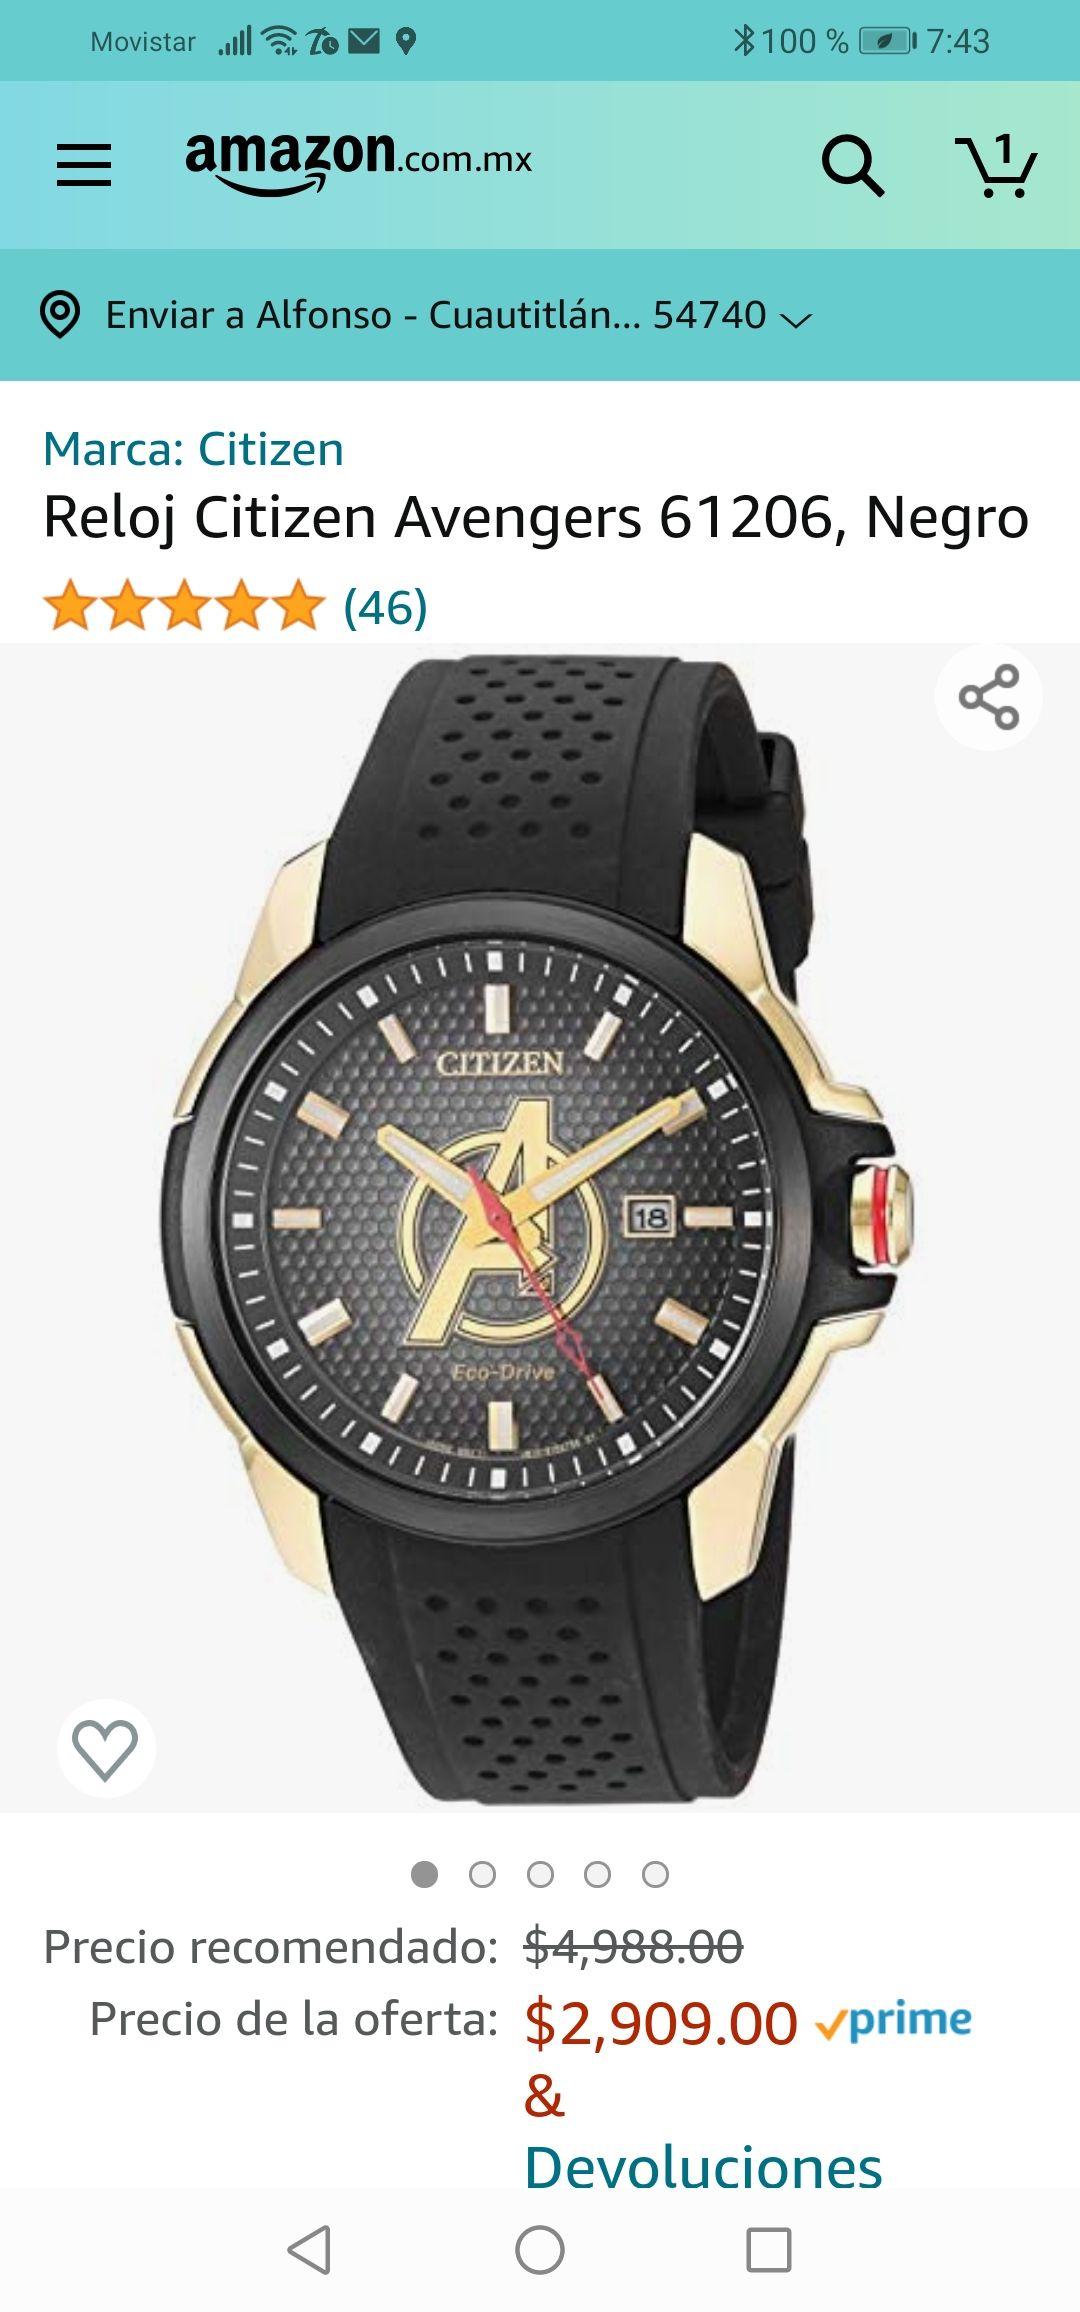 Amazon : Reloj Citizen Avengers 61206, Negro